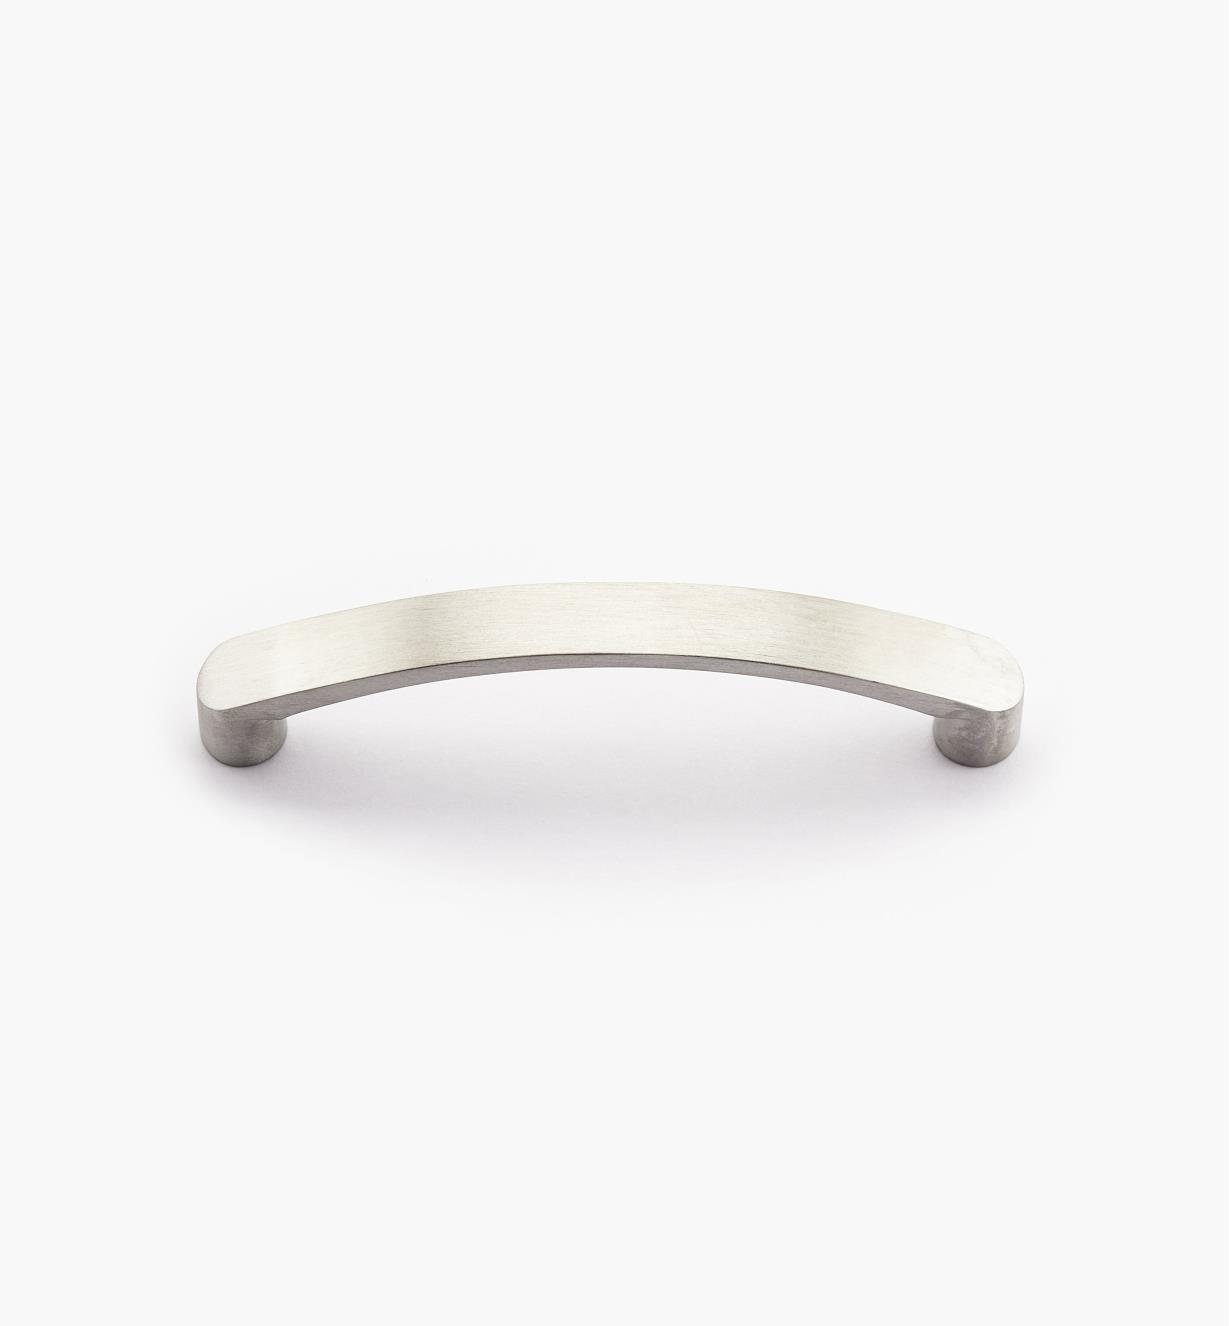 01W8171 - 96mm Flat Bow